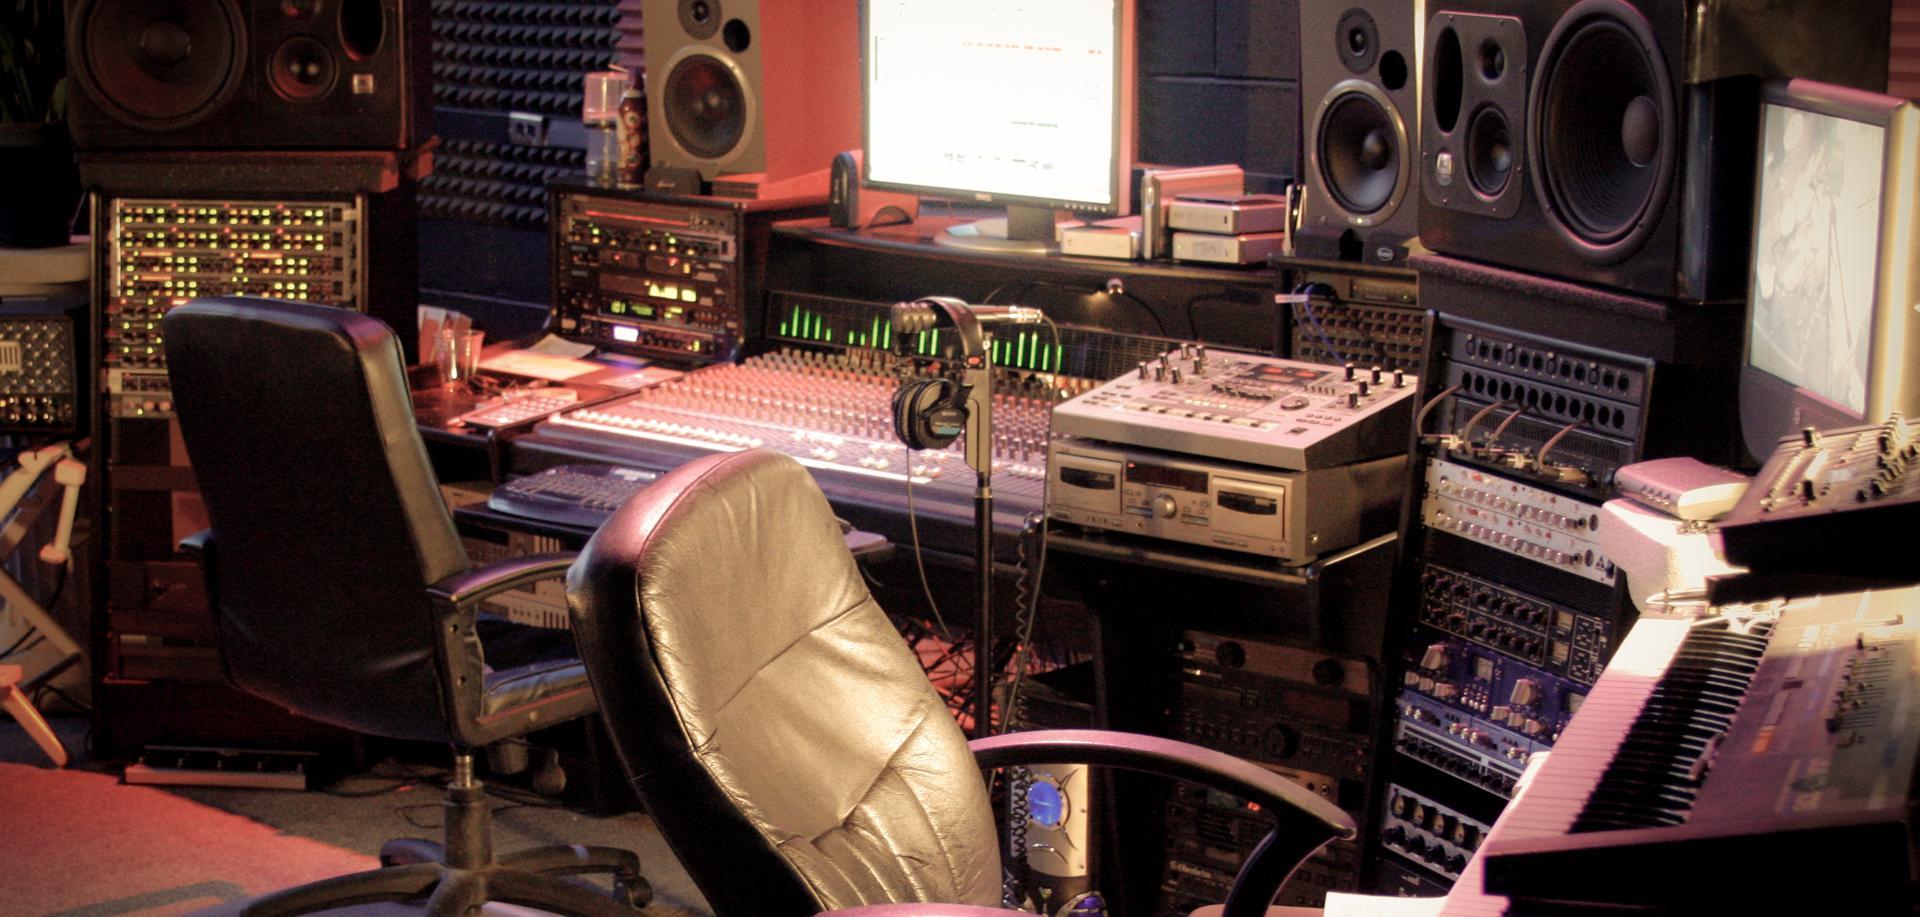 Profile Music Center